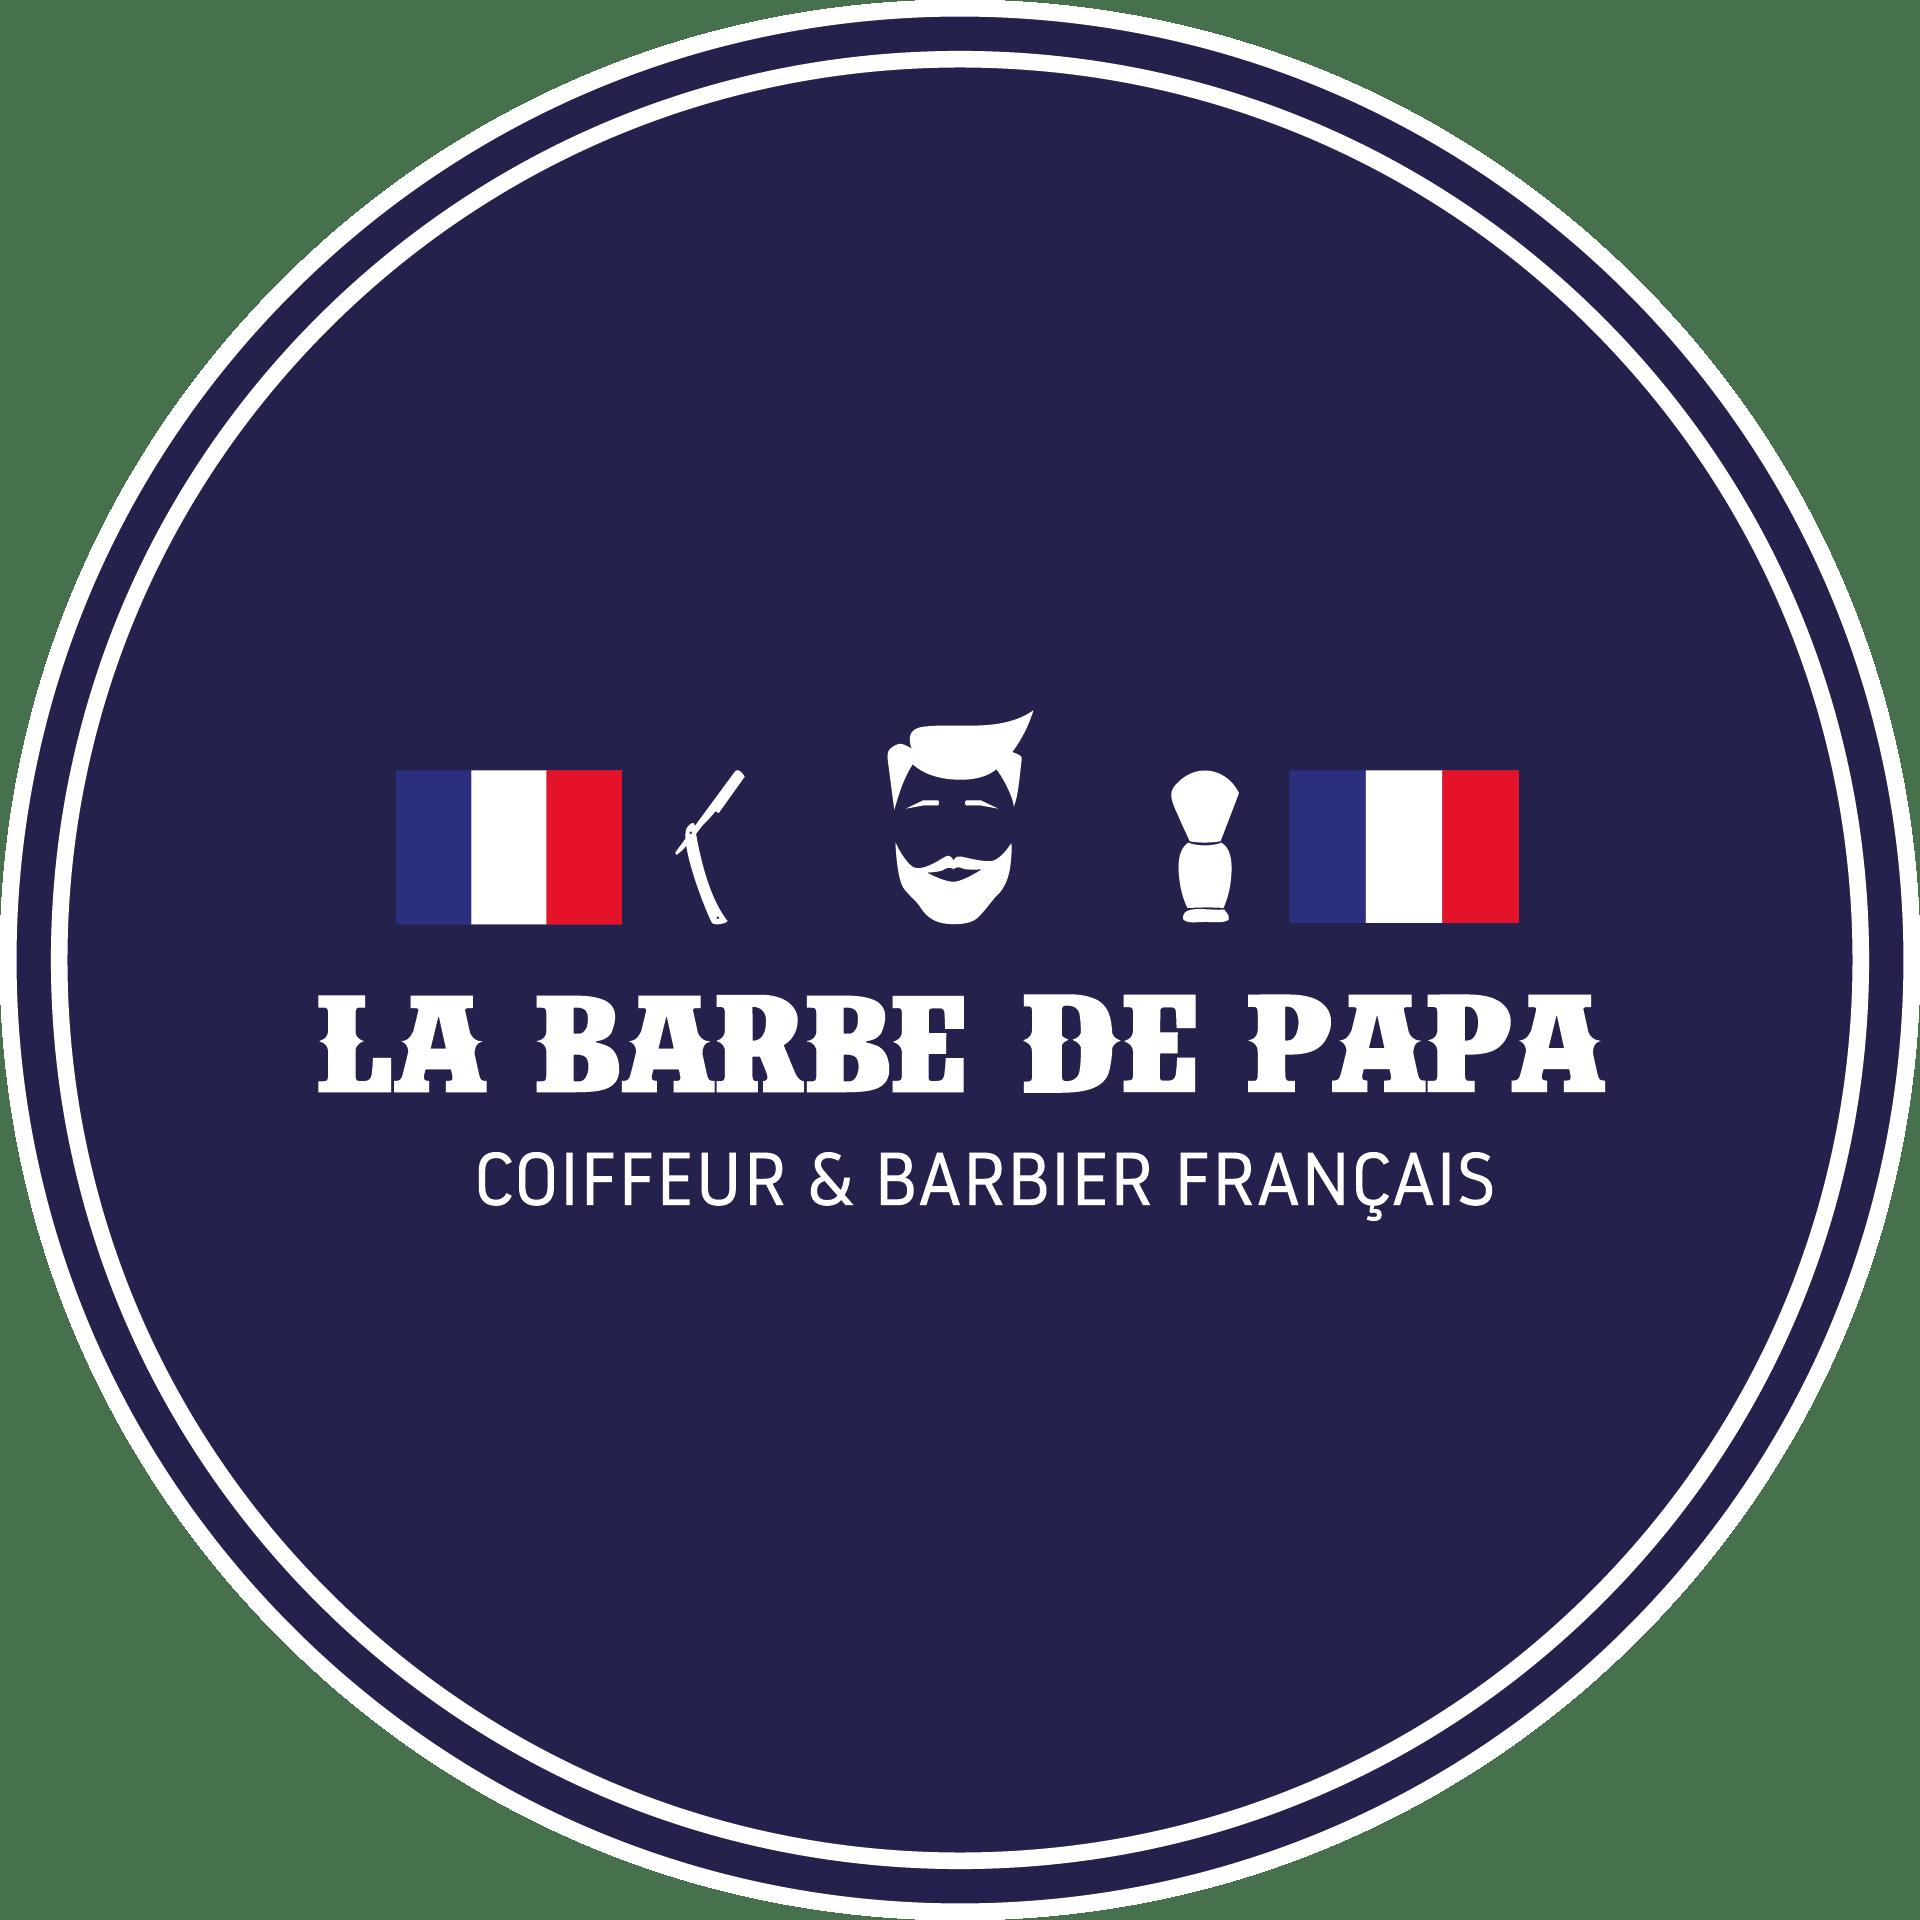 La Barbe de Papa